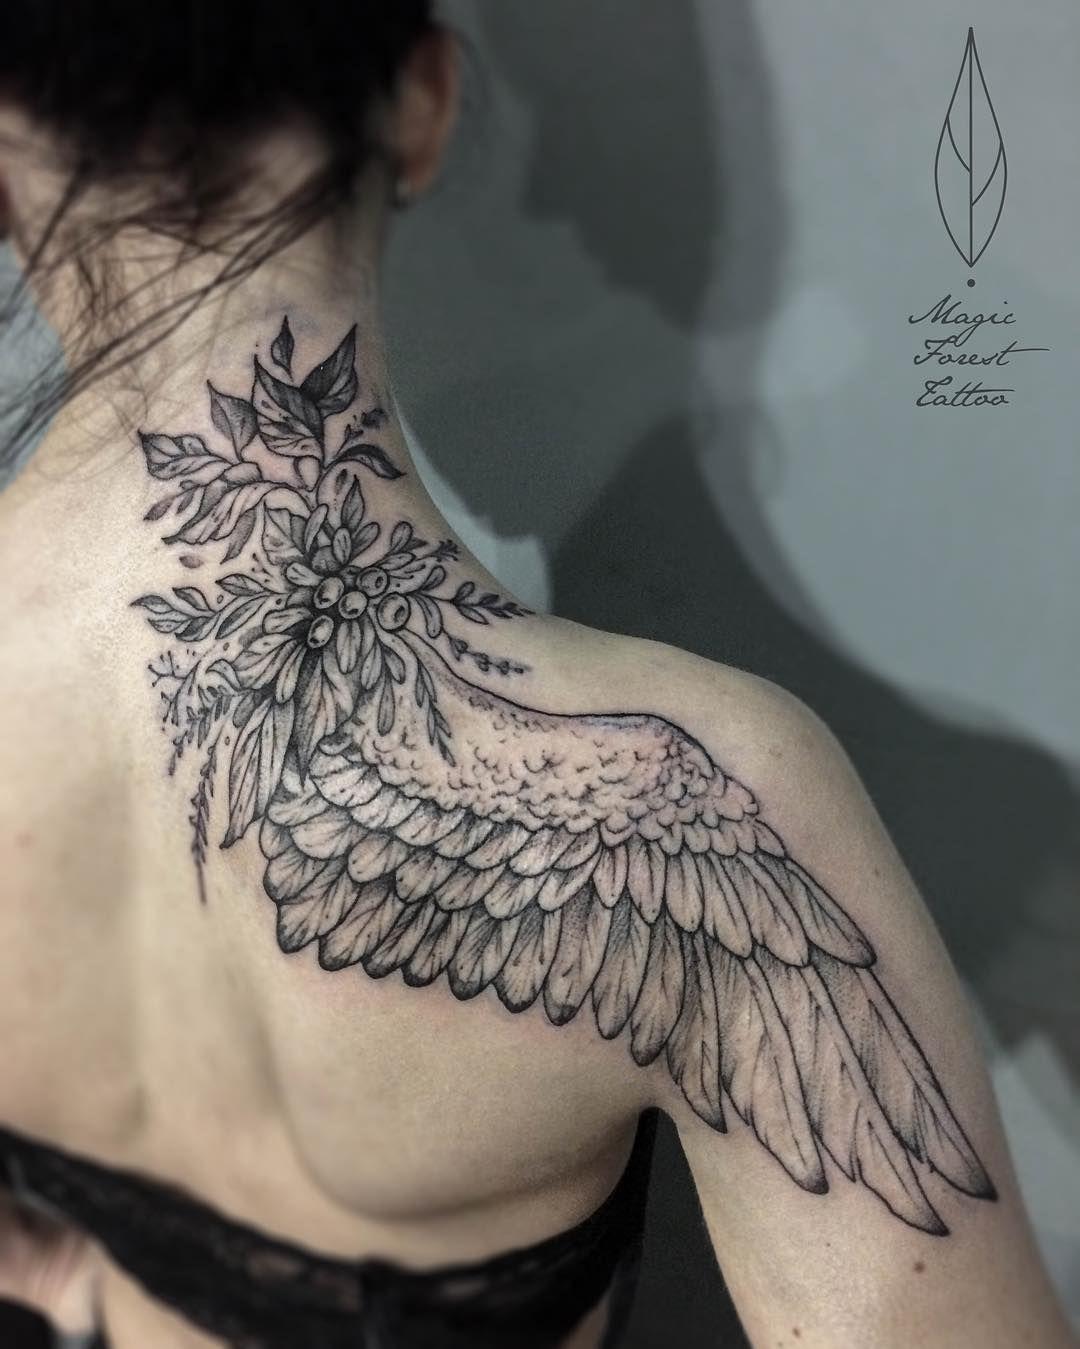 Wing Tattoo Shoulder Blades Winged | — Ta...